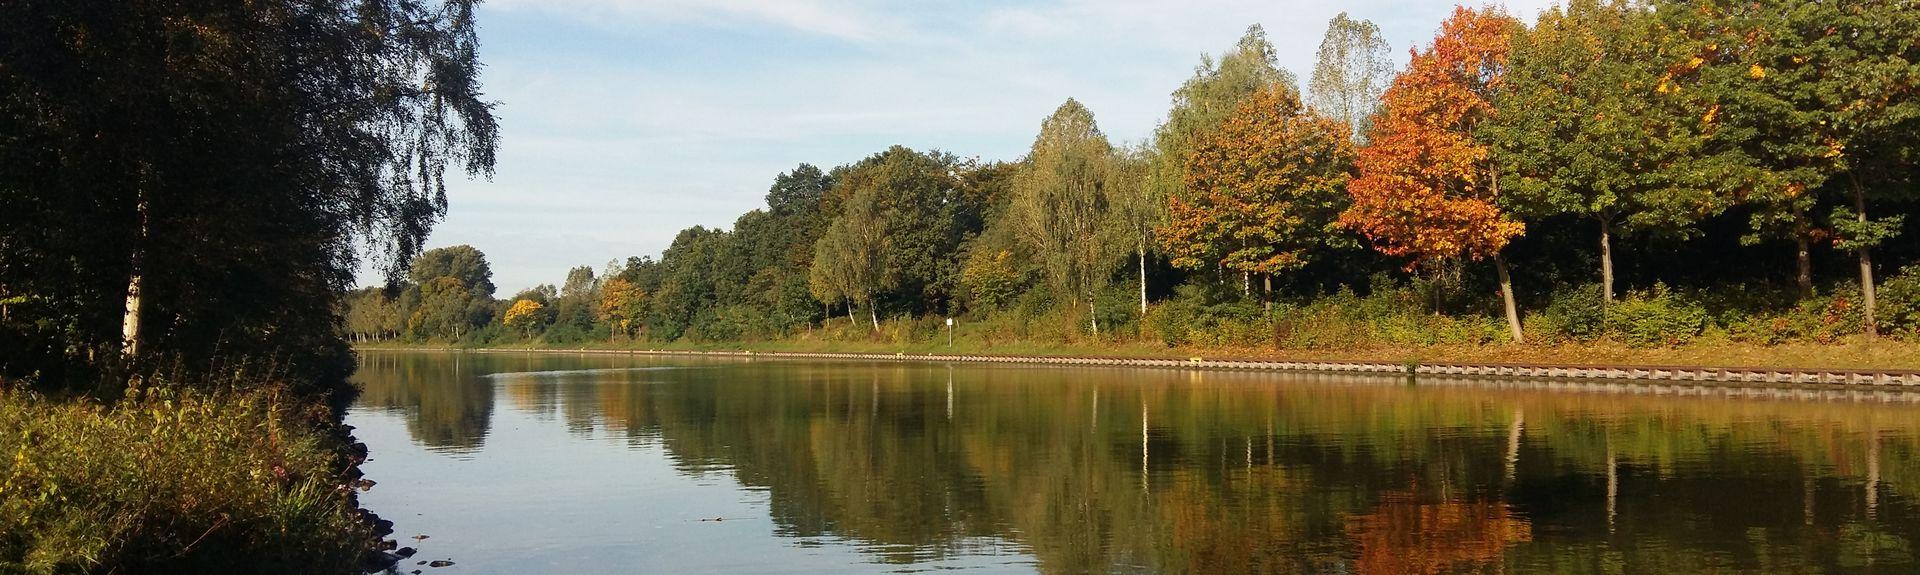 Hamminkeln, Renânia do Norte-Vestfália, Alemanha